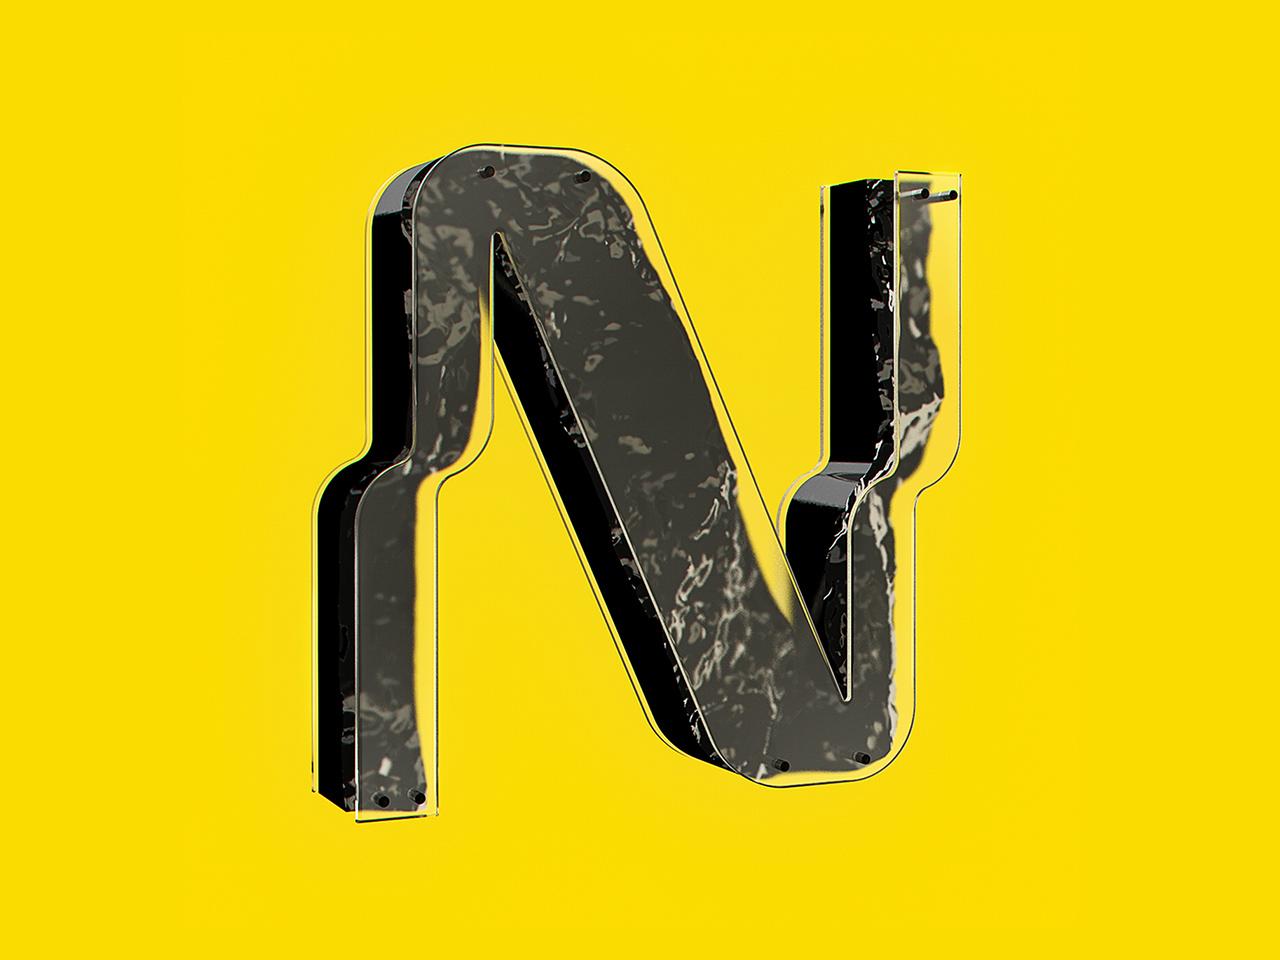 N letterwork lettering letter c4d42 36daysoftype-n 36daysoftype